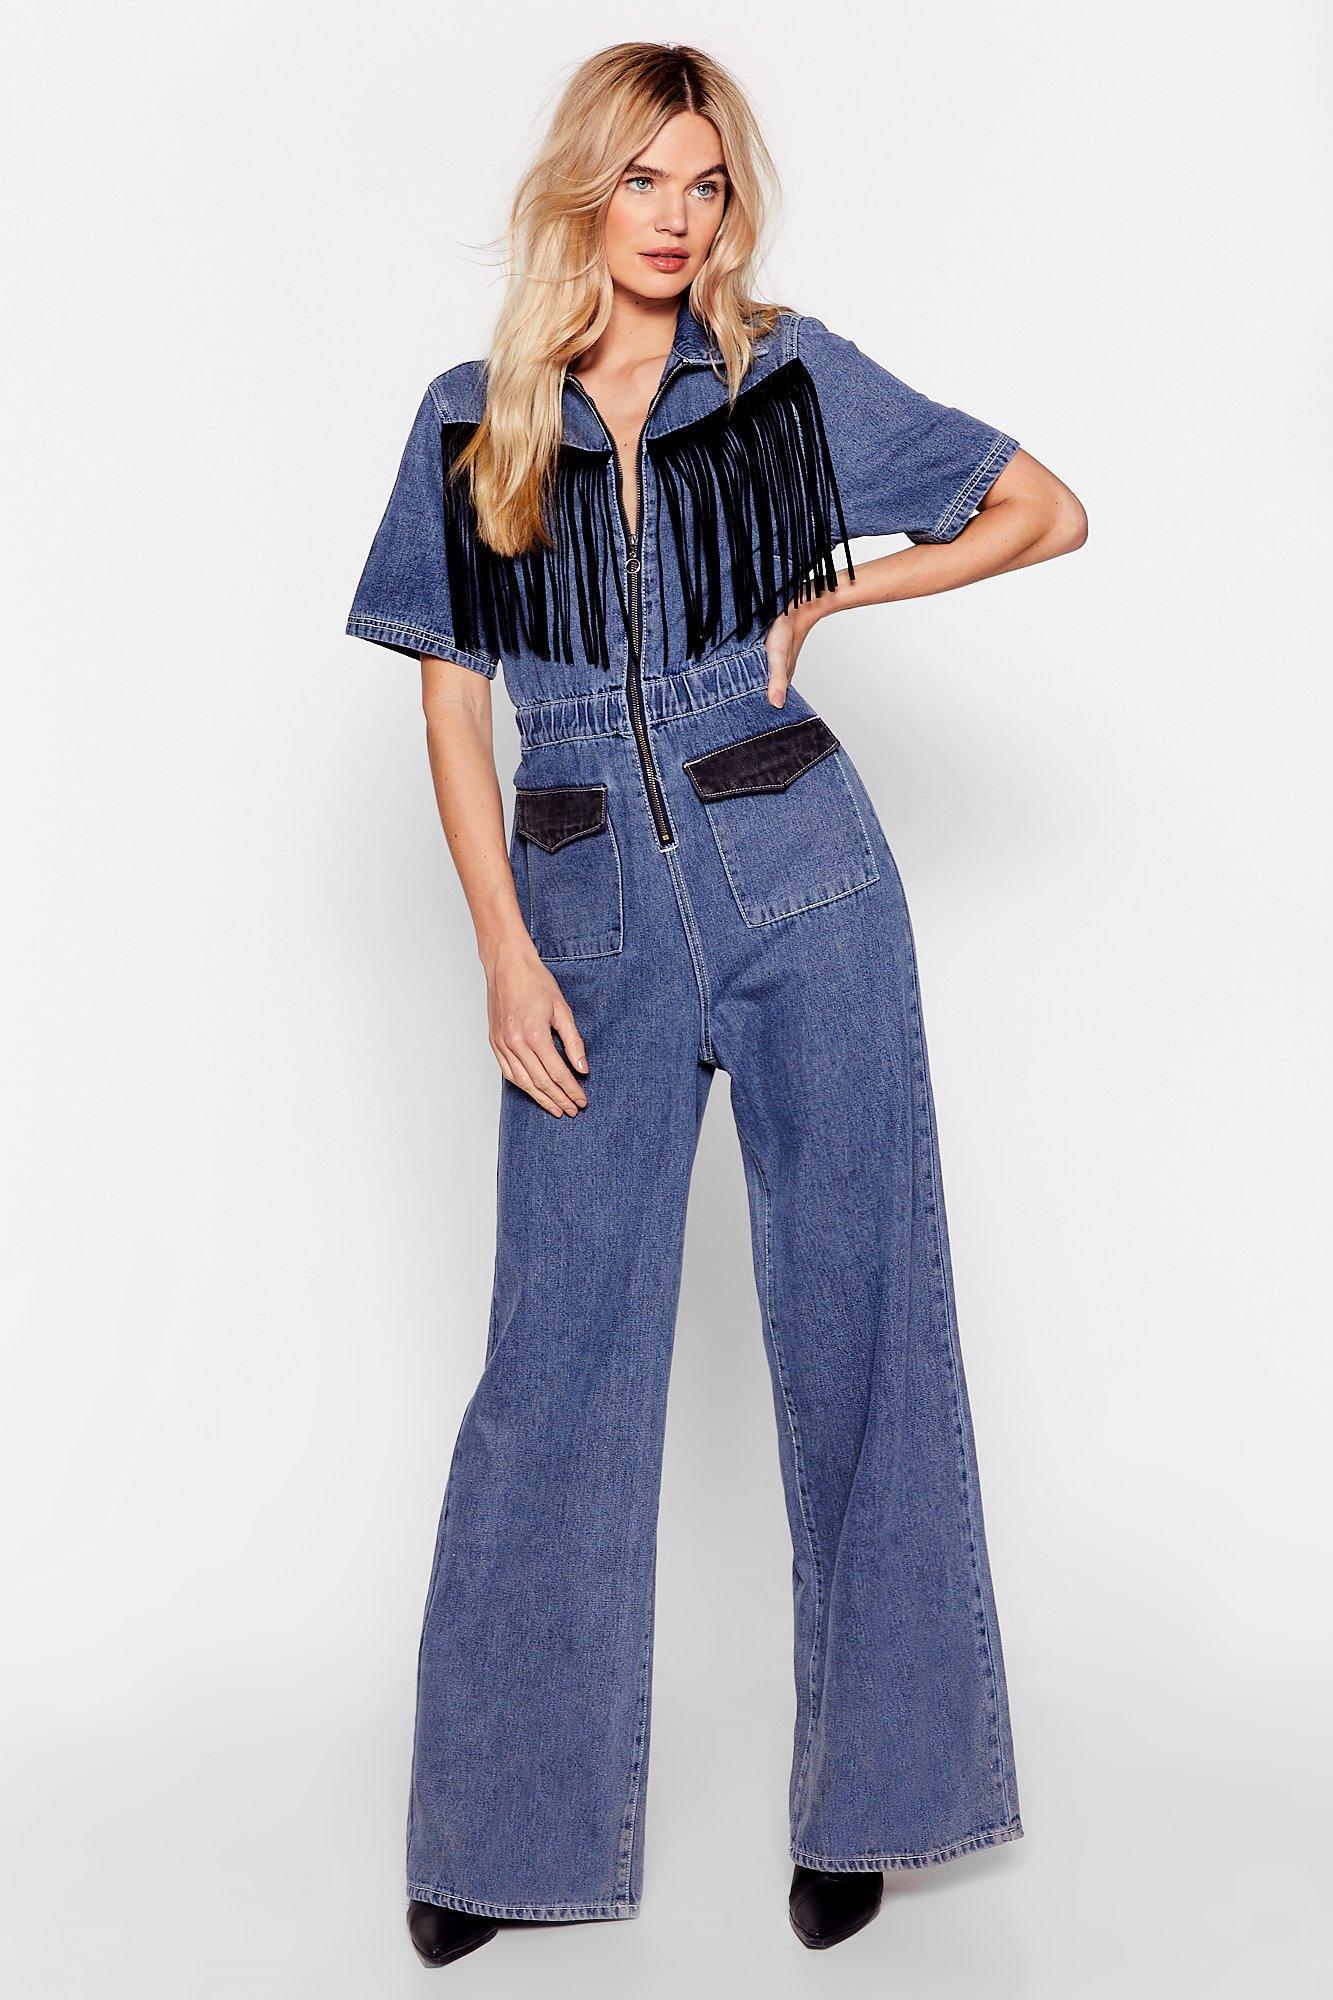 70s Jumpsuit | Disco Jumpsuits, Sequin Rompers Womens Fringe Denim Jumpsuit - Blue - 6 $44.40 AT vintagedancer.com